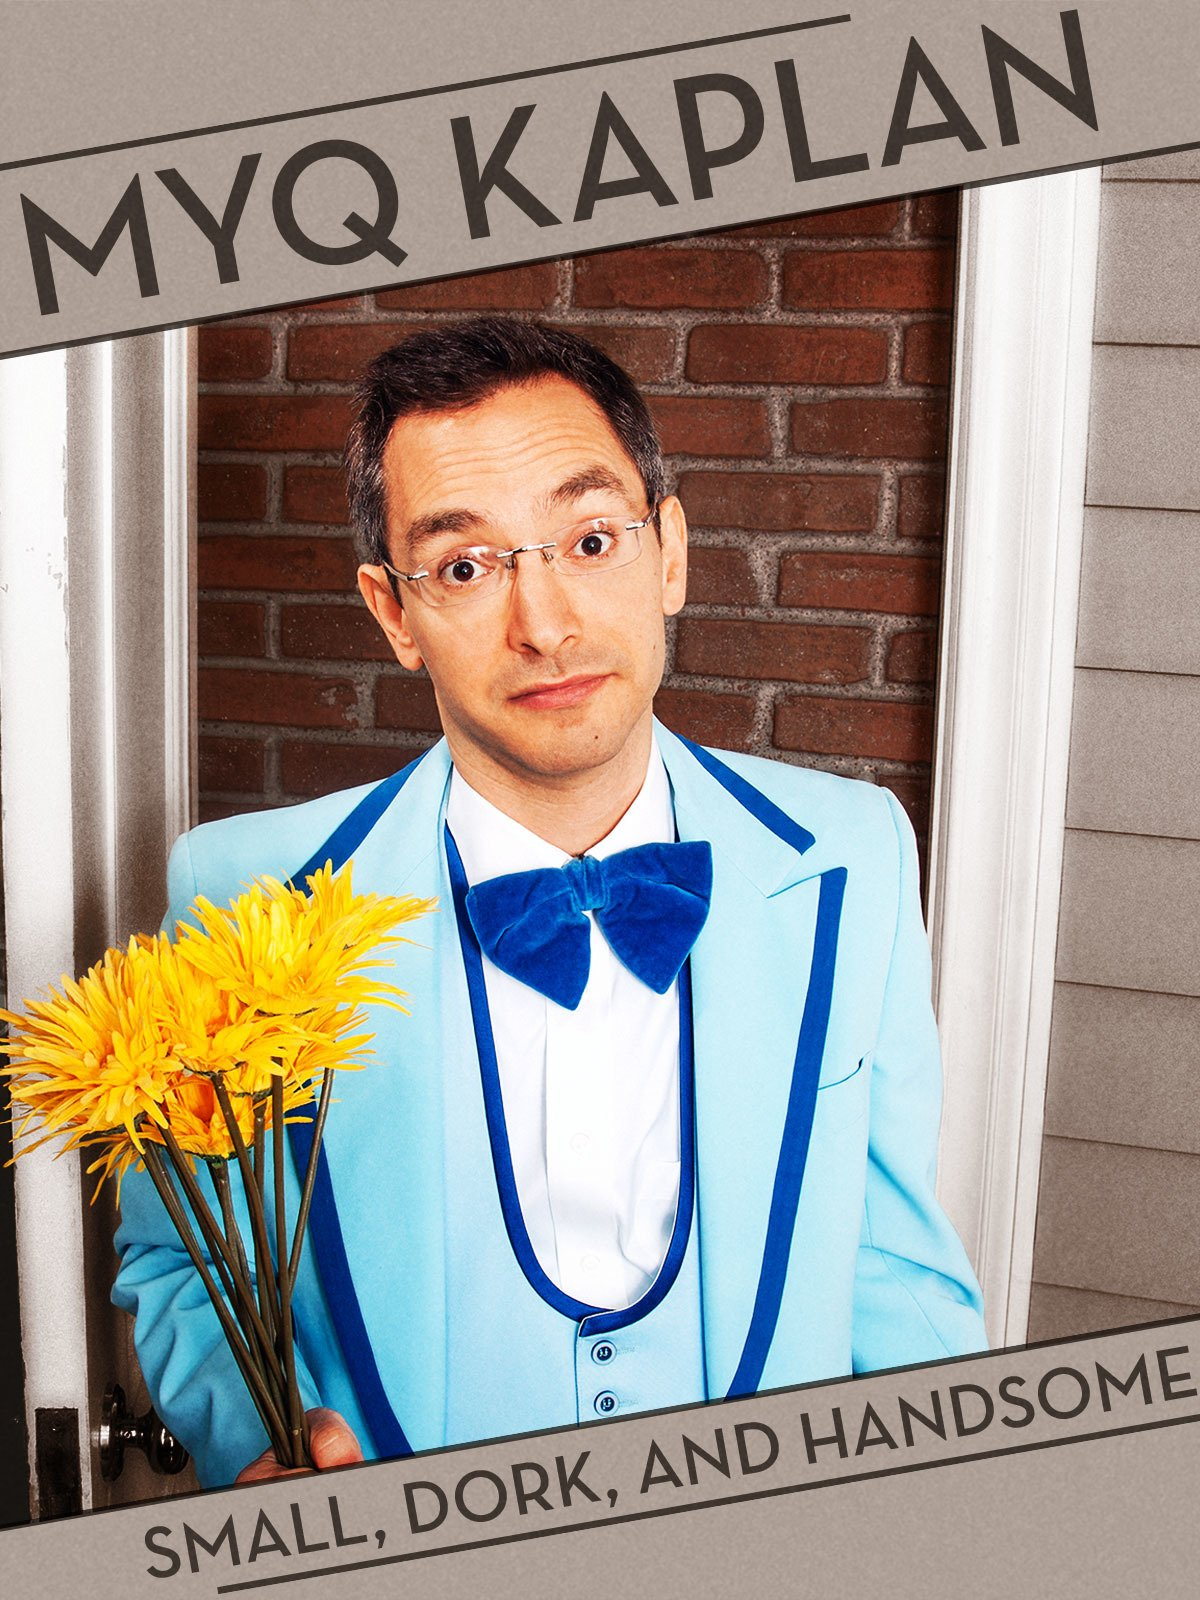 Myq Kaplan: Small, Dork, and Handsome